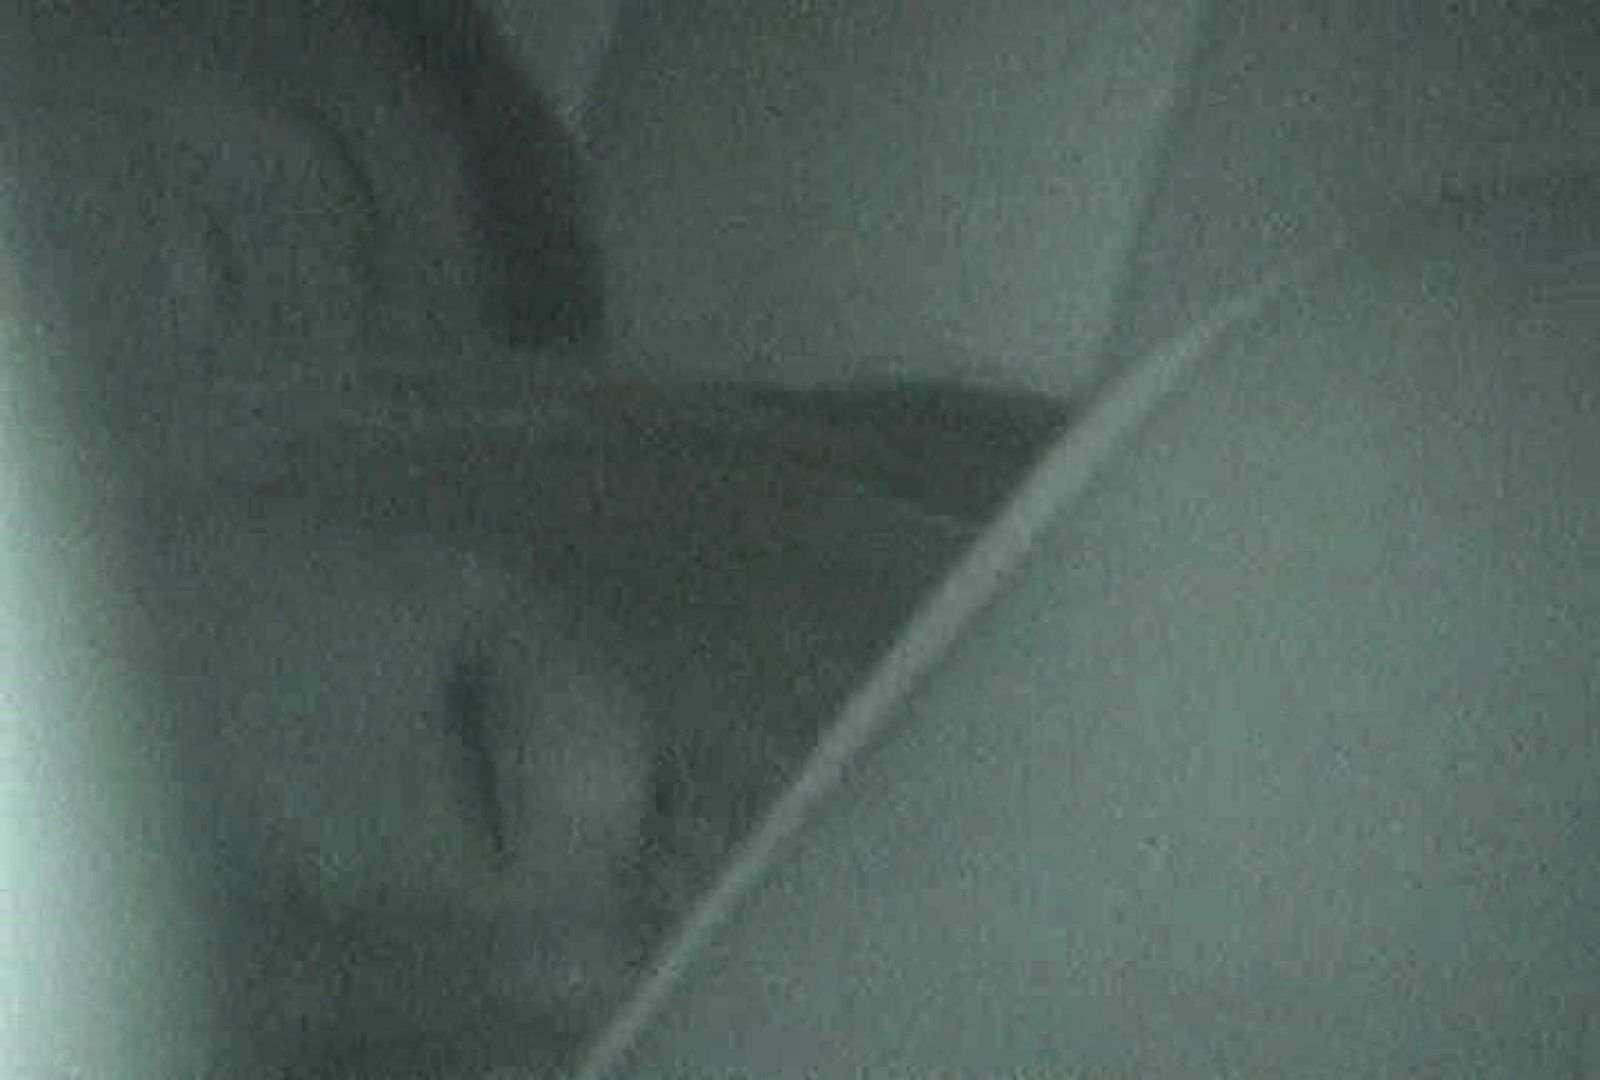 充血監督の深夜の運動会Vol.92 野外 性交動画流出 97pic 7